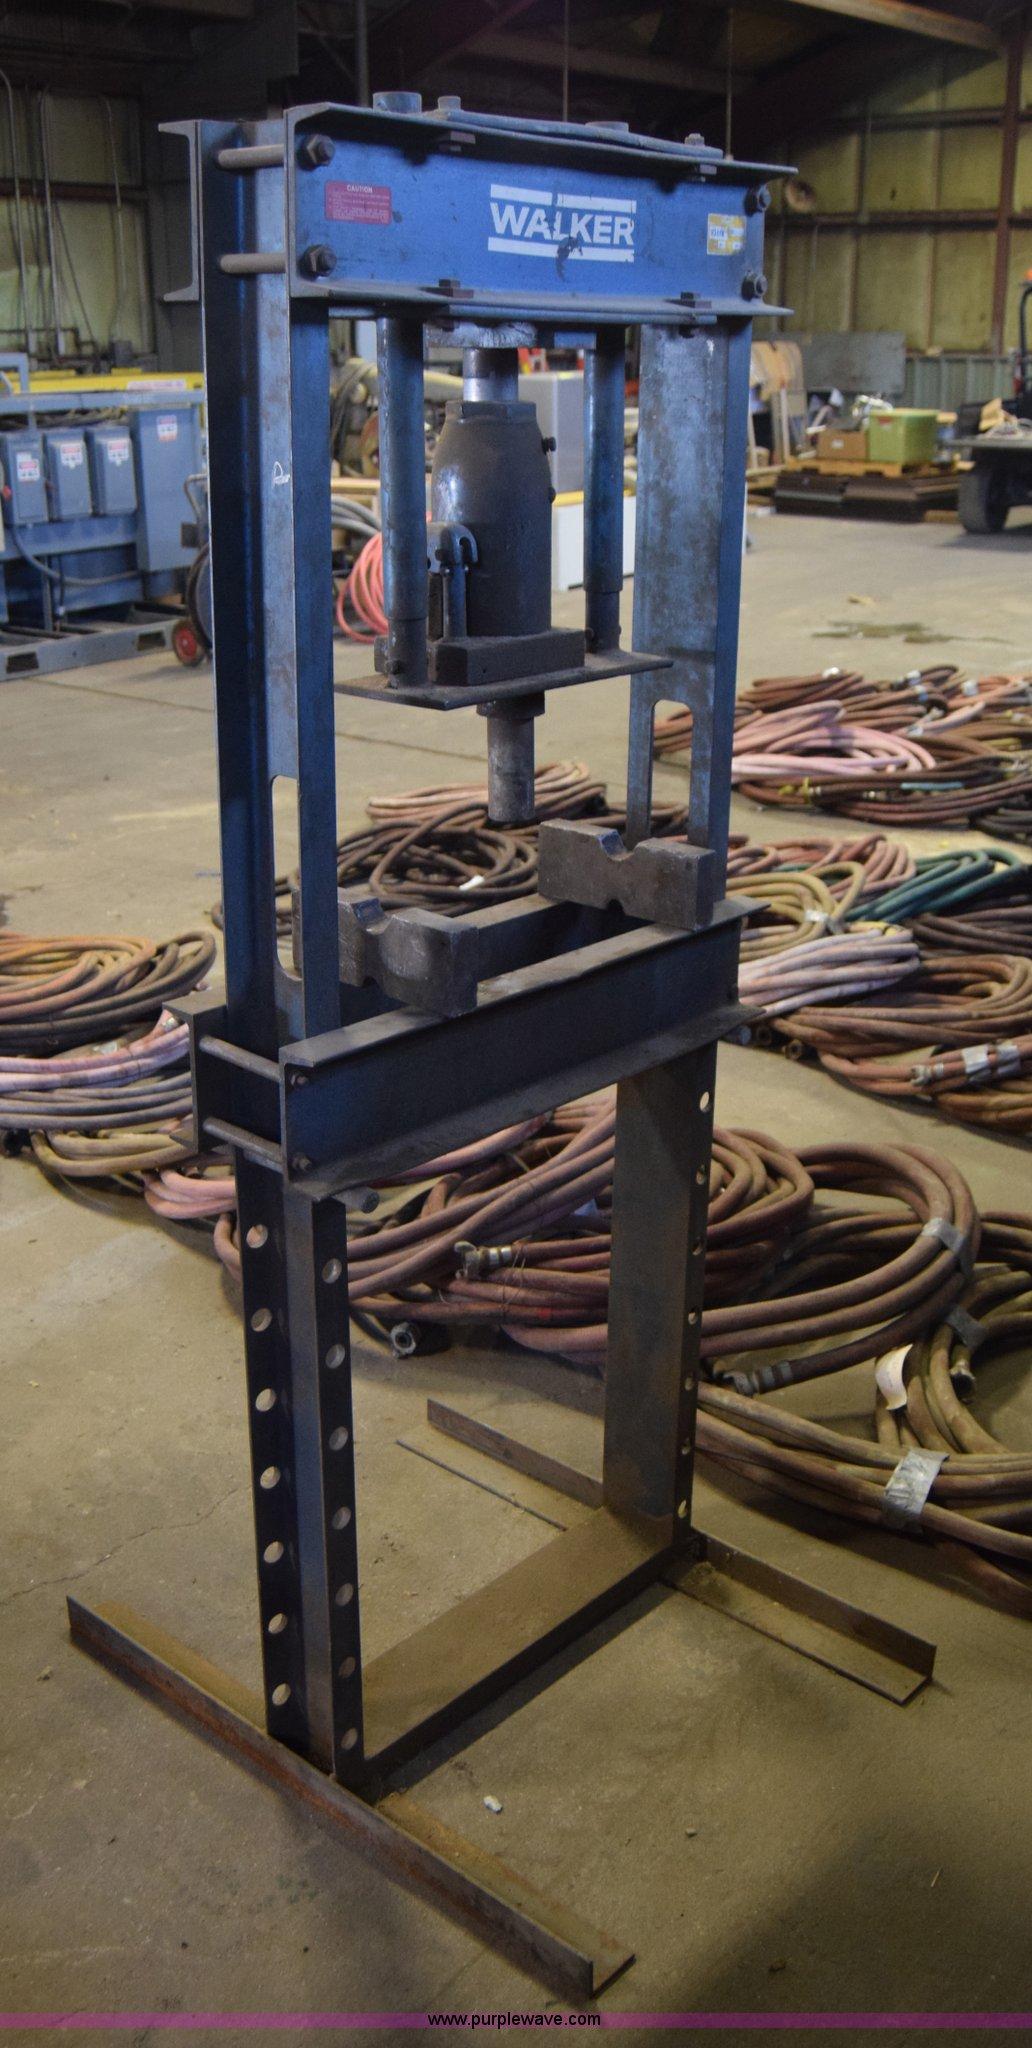 Walker 93618 hydraulic press | Item BL9951 | SOLD! November